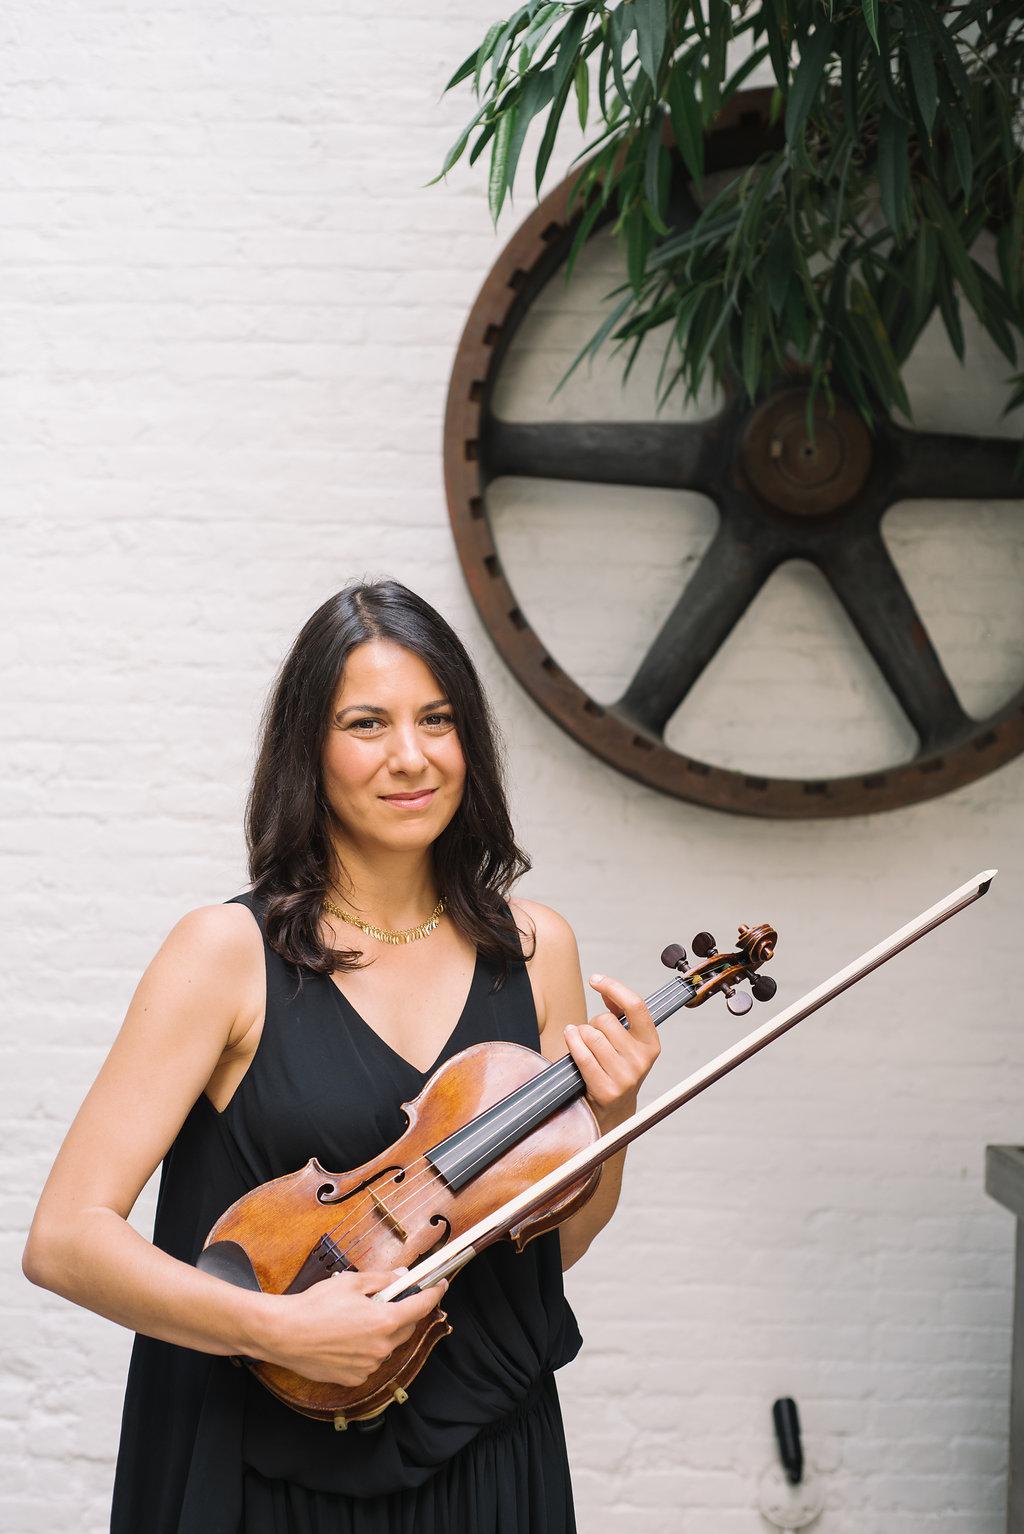 Copy of Erica Dicker - Violin